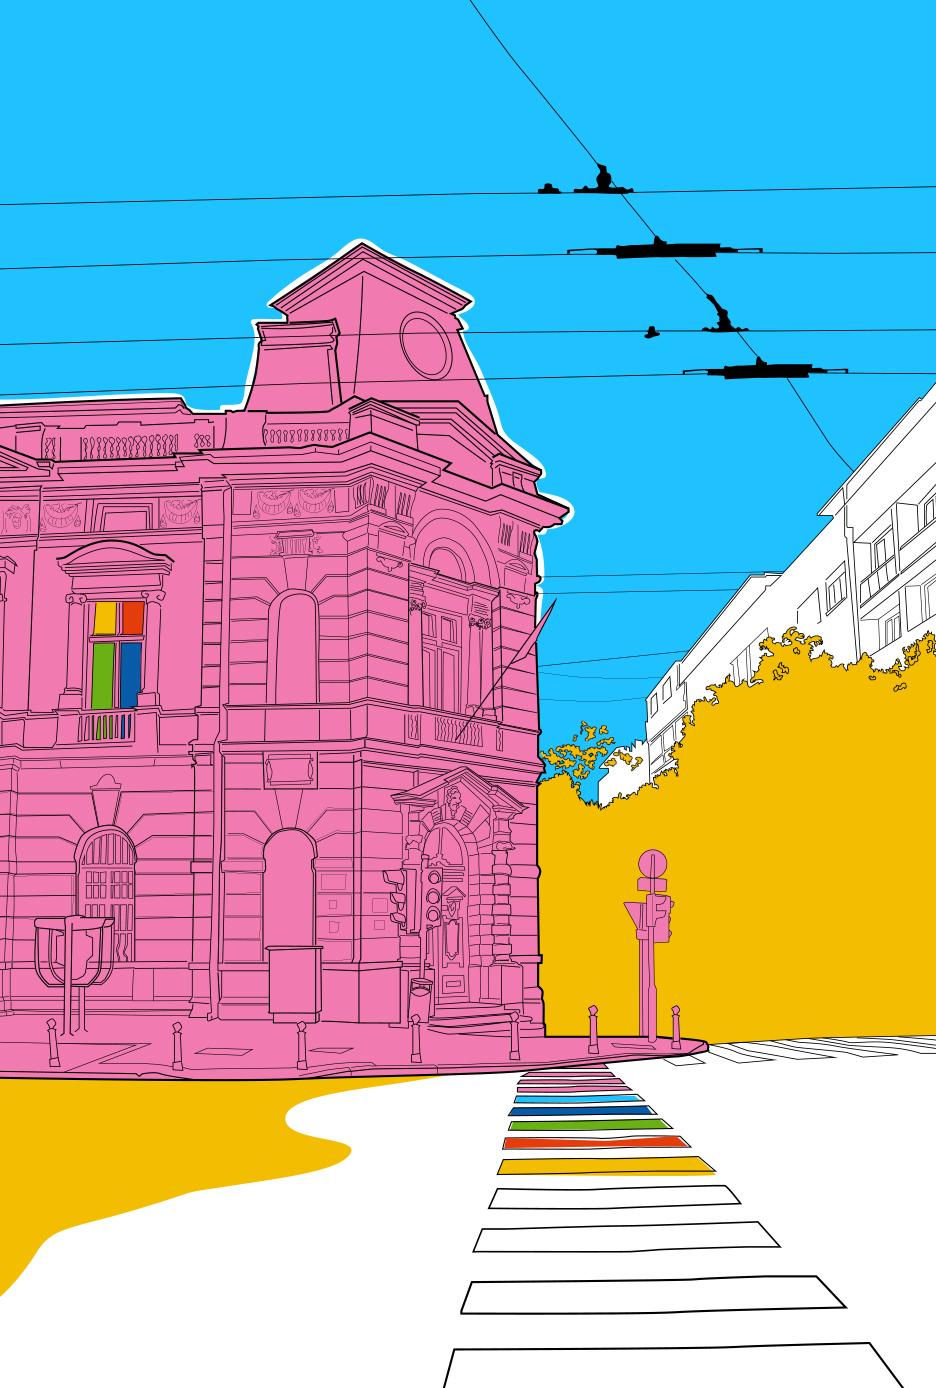 vector ILLUSTRATION  digital city streets scene town Vector Illustration digital illustration colorful